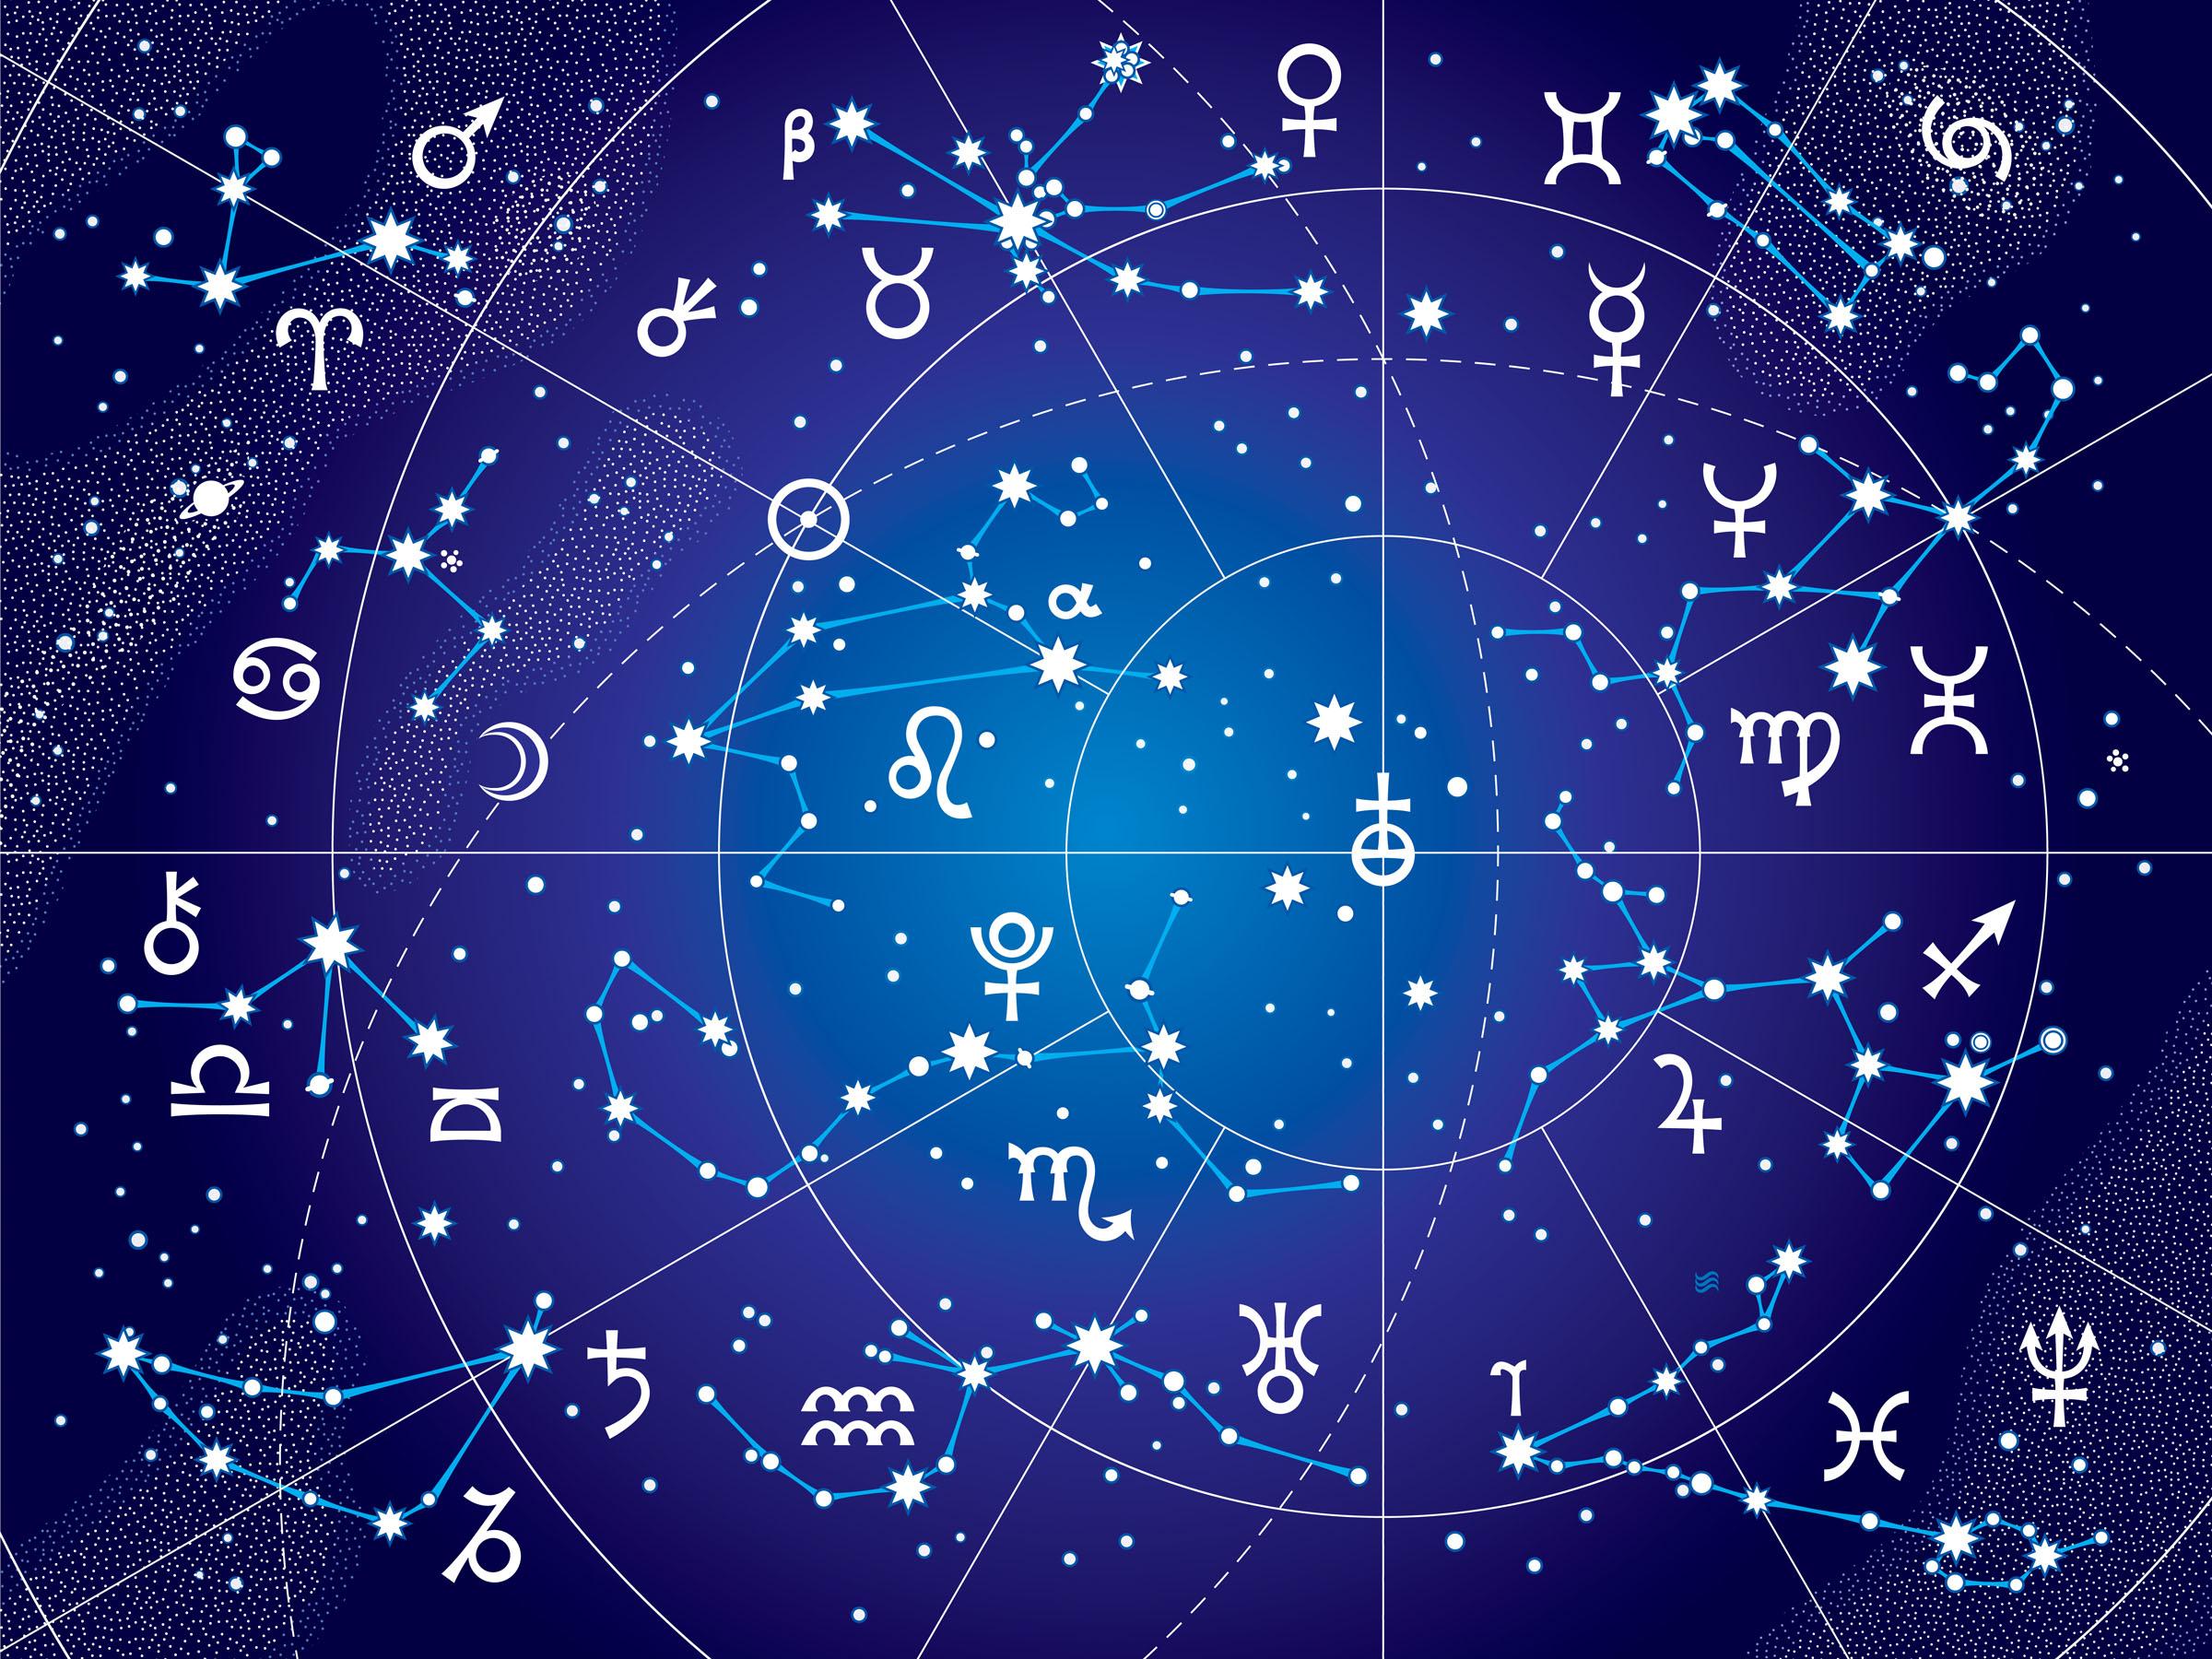 XII Constellations of Zodiac (Ultraviolet Blueprint version)